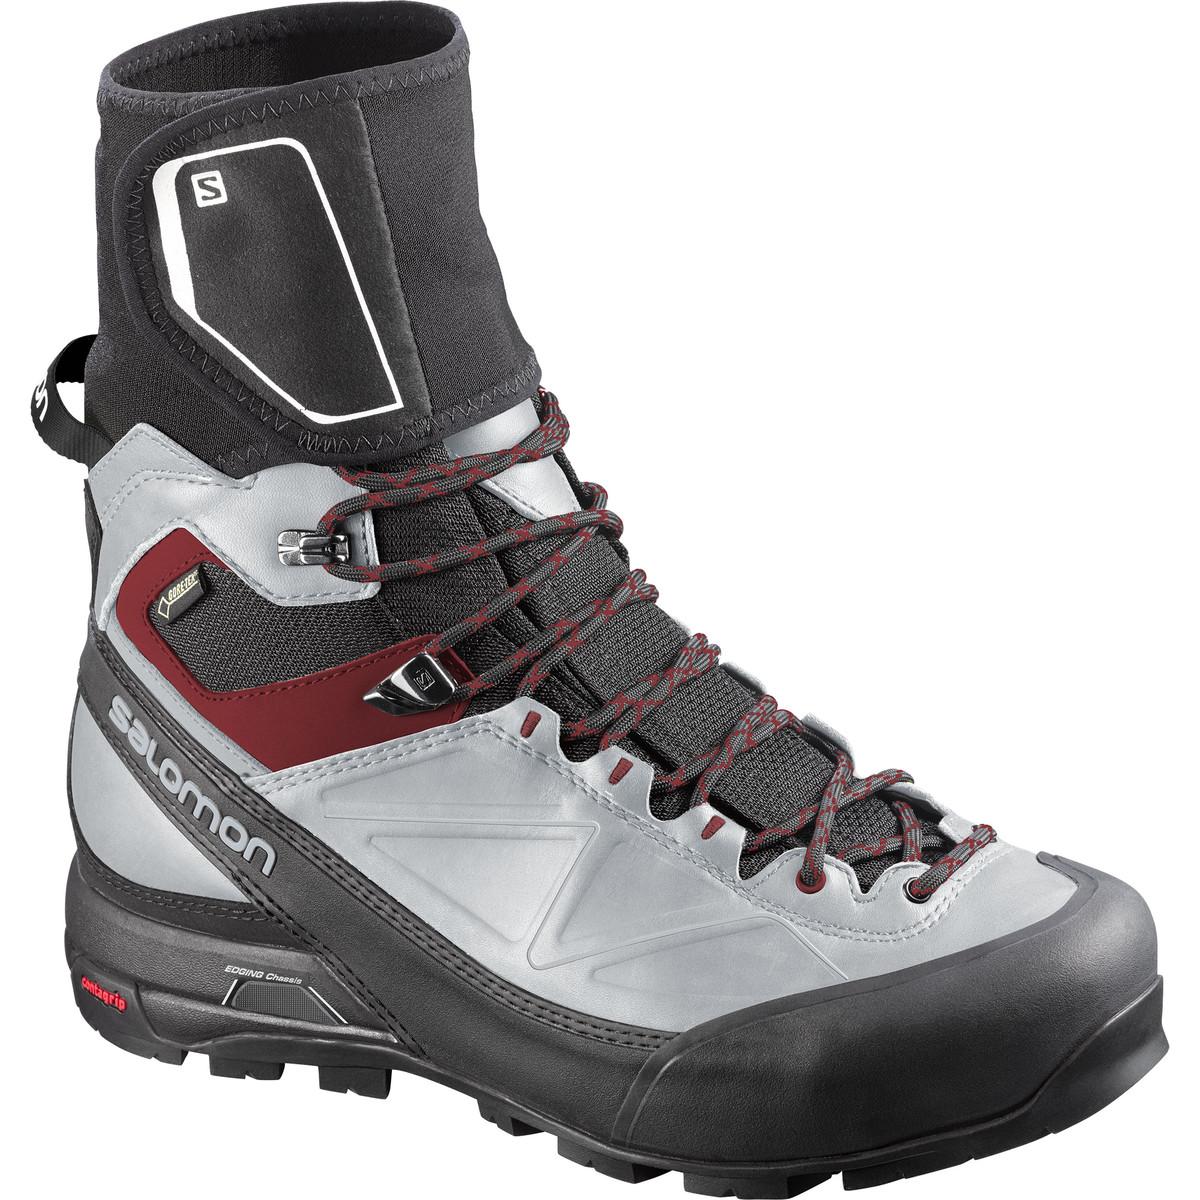 Salomon X Alp Pro GTX Boot